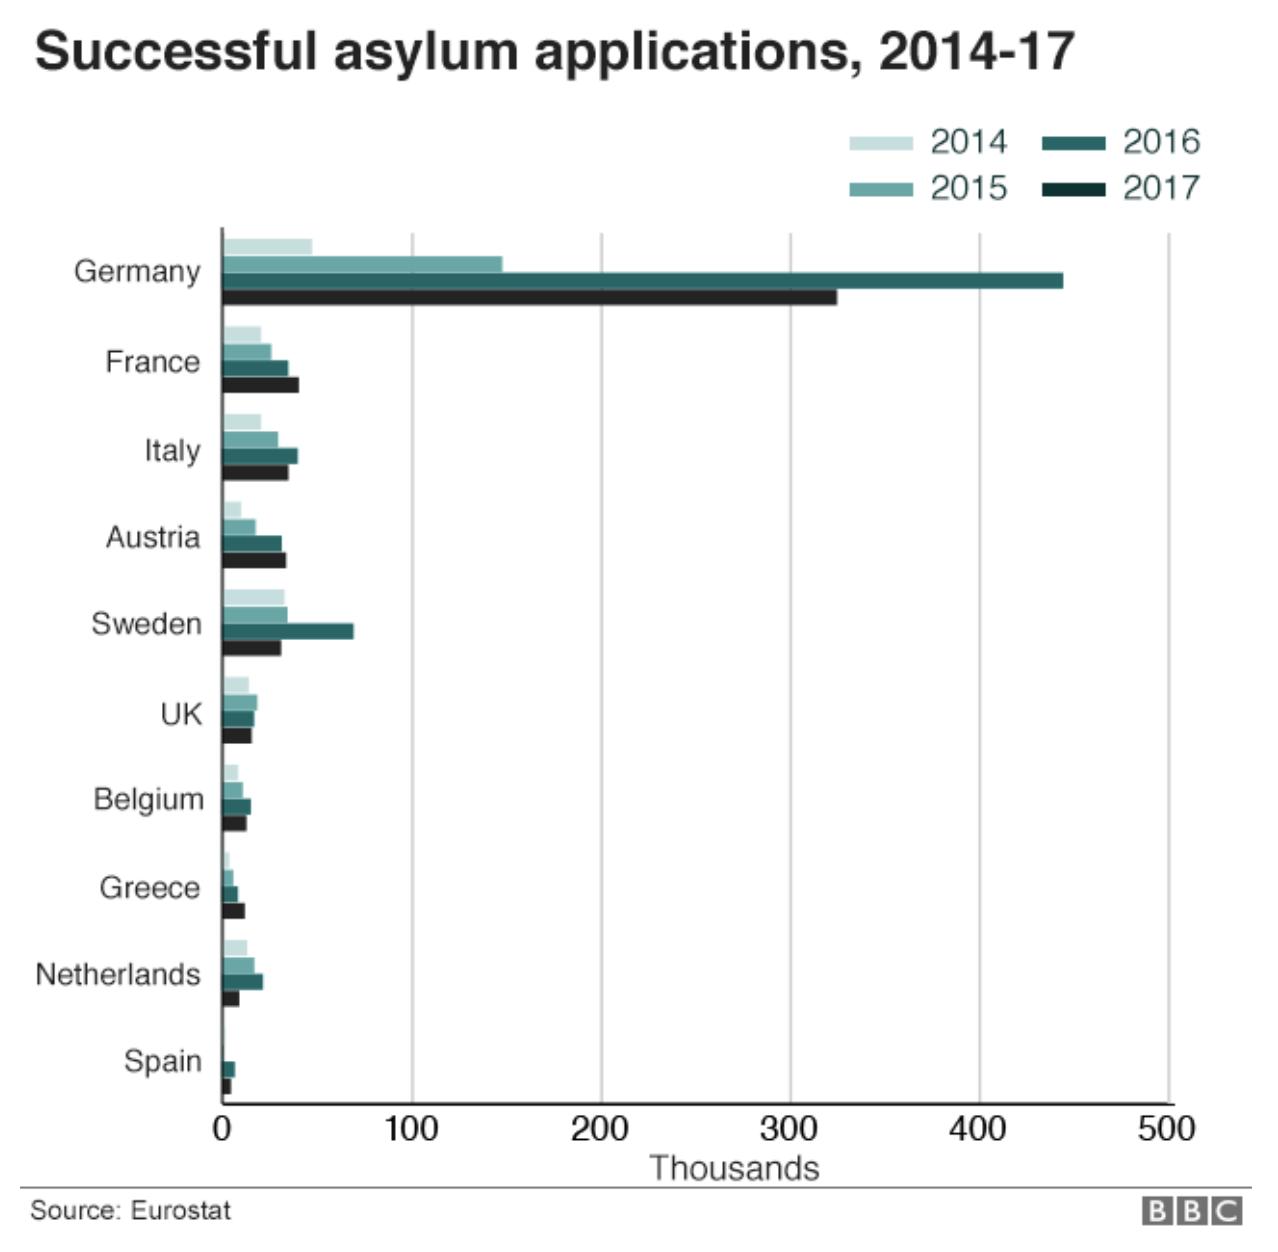 Source: BBC, 2018b